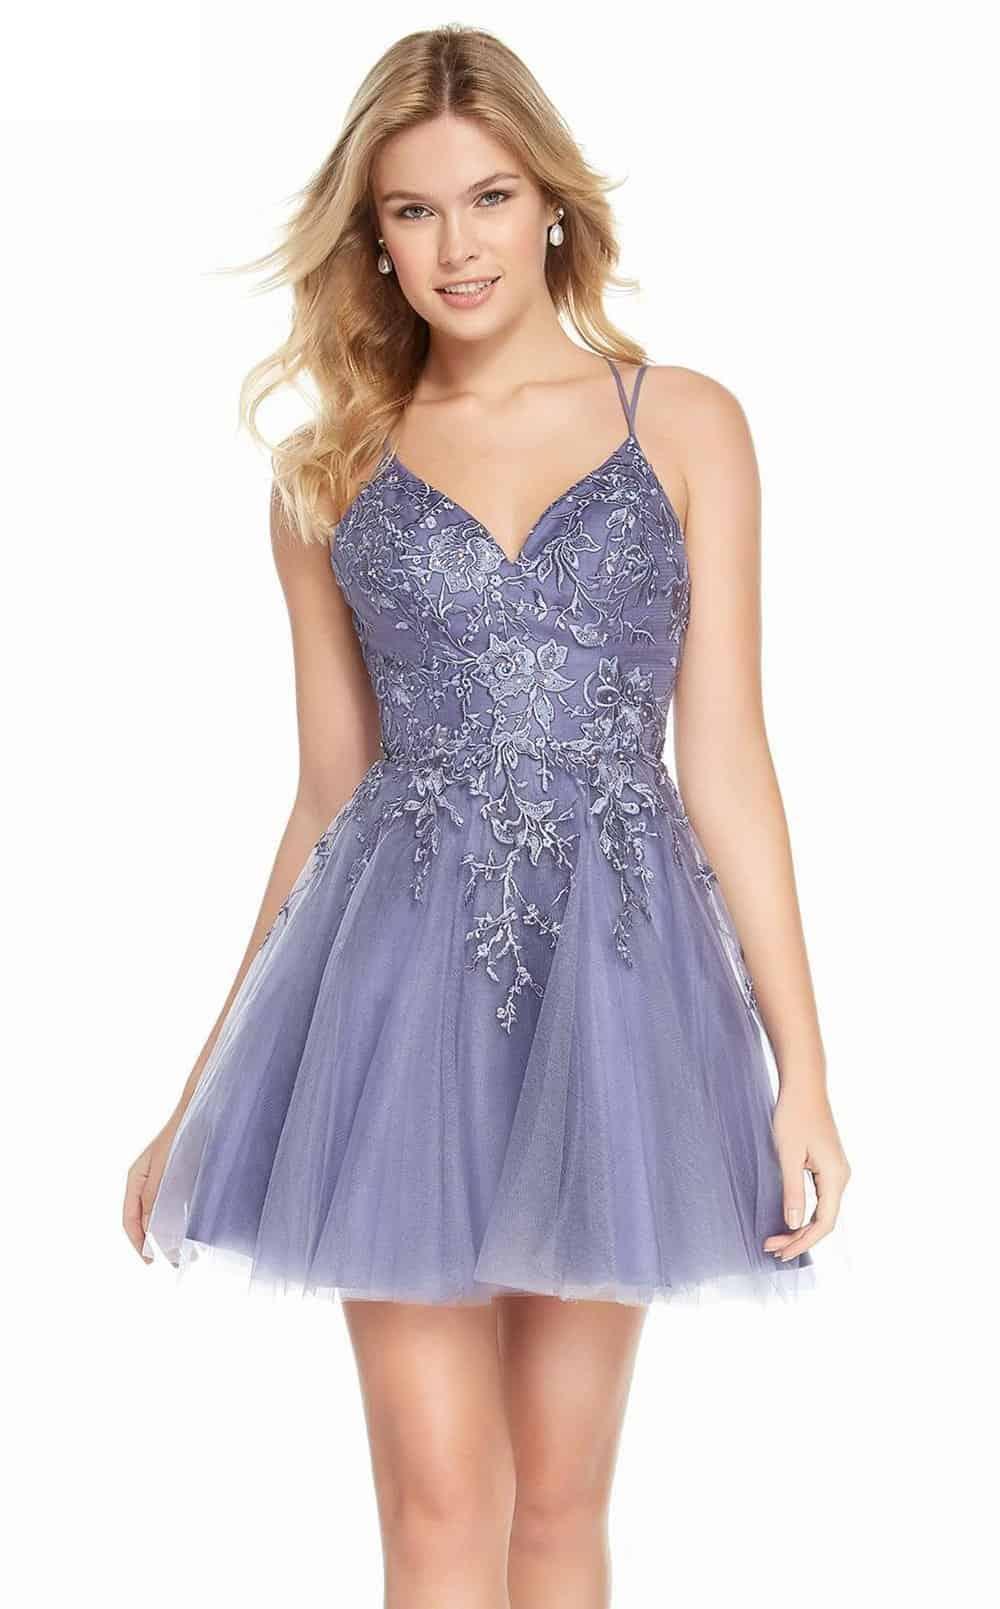 Lavendar Dress